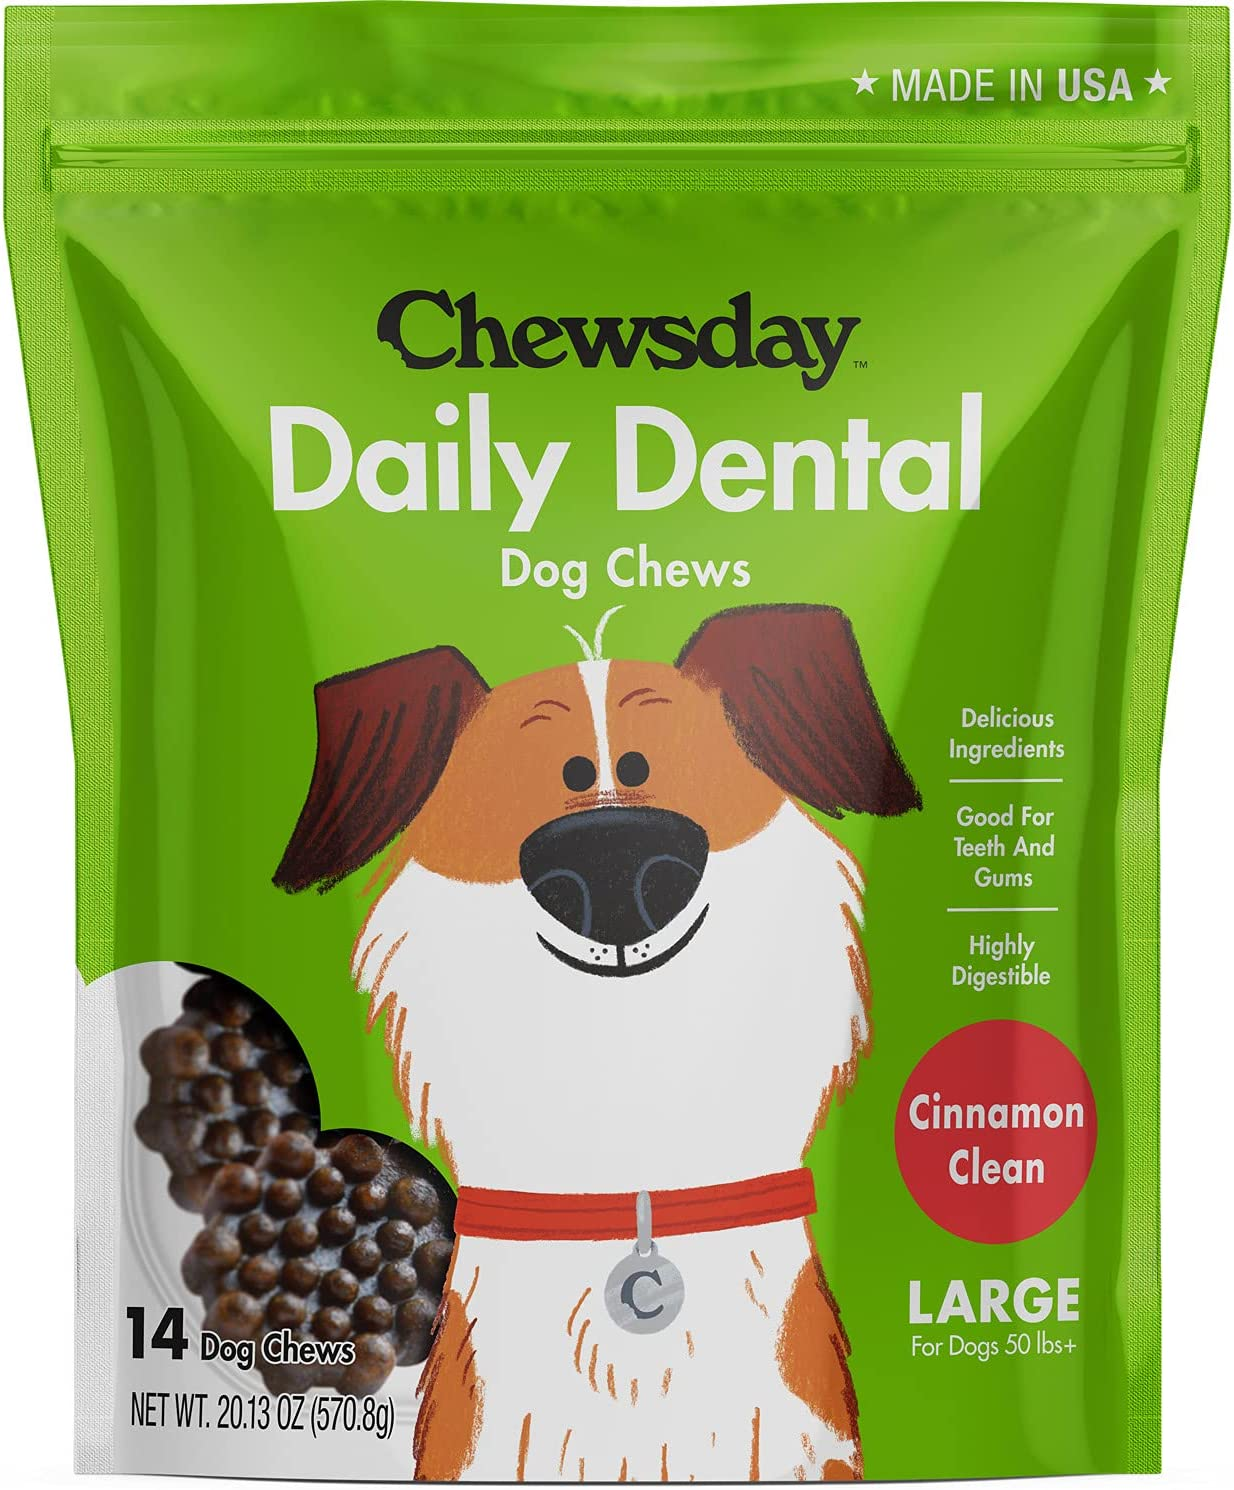 Chewsday Cinnamon Clean Daily Dental Dog Chews, Large, 14 Count